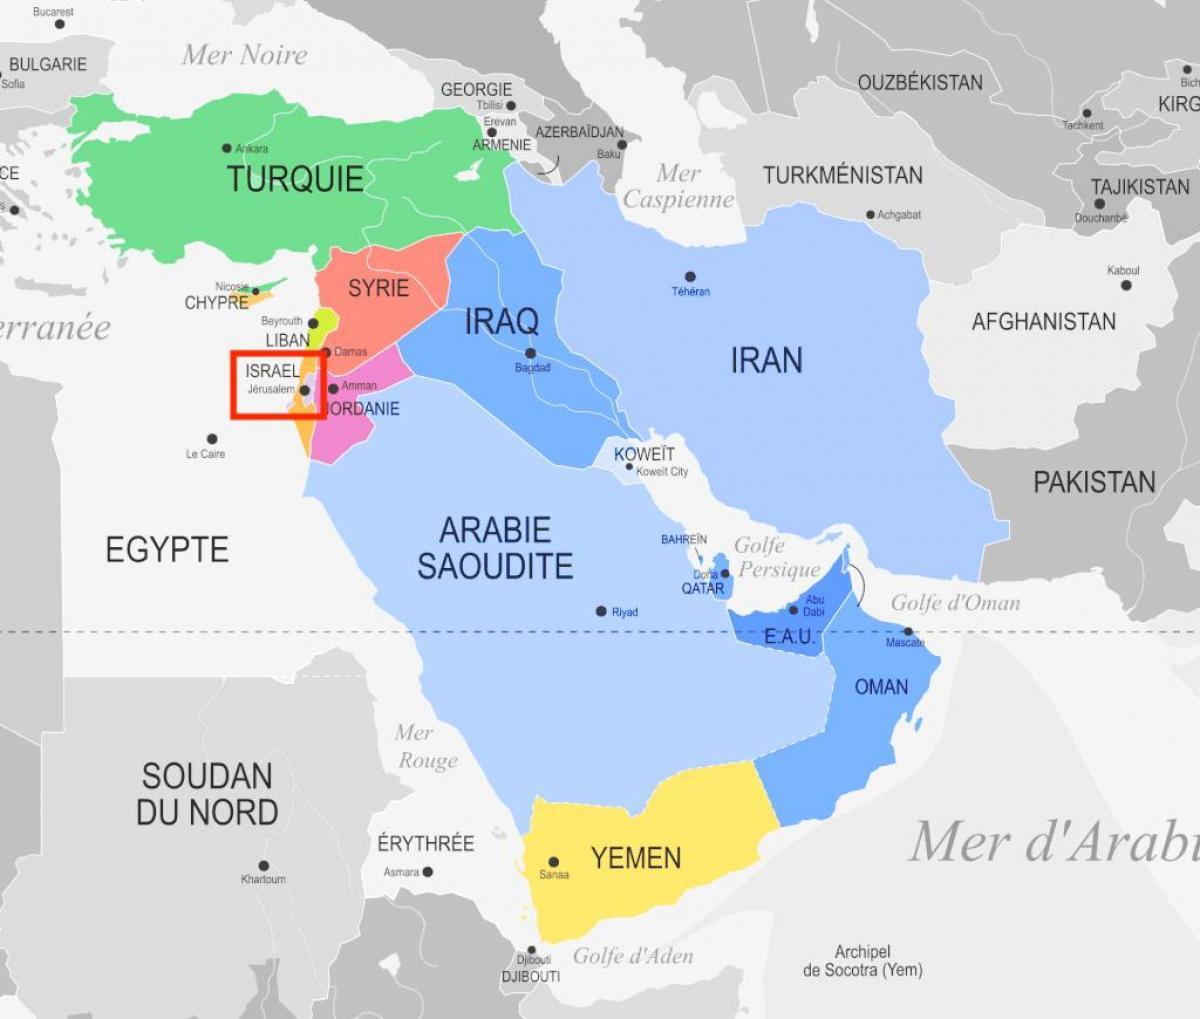 Jerusalem map middle east jerusalem on map of middle east israel jerusalem on map of middle east gumiabroncs Image collections